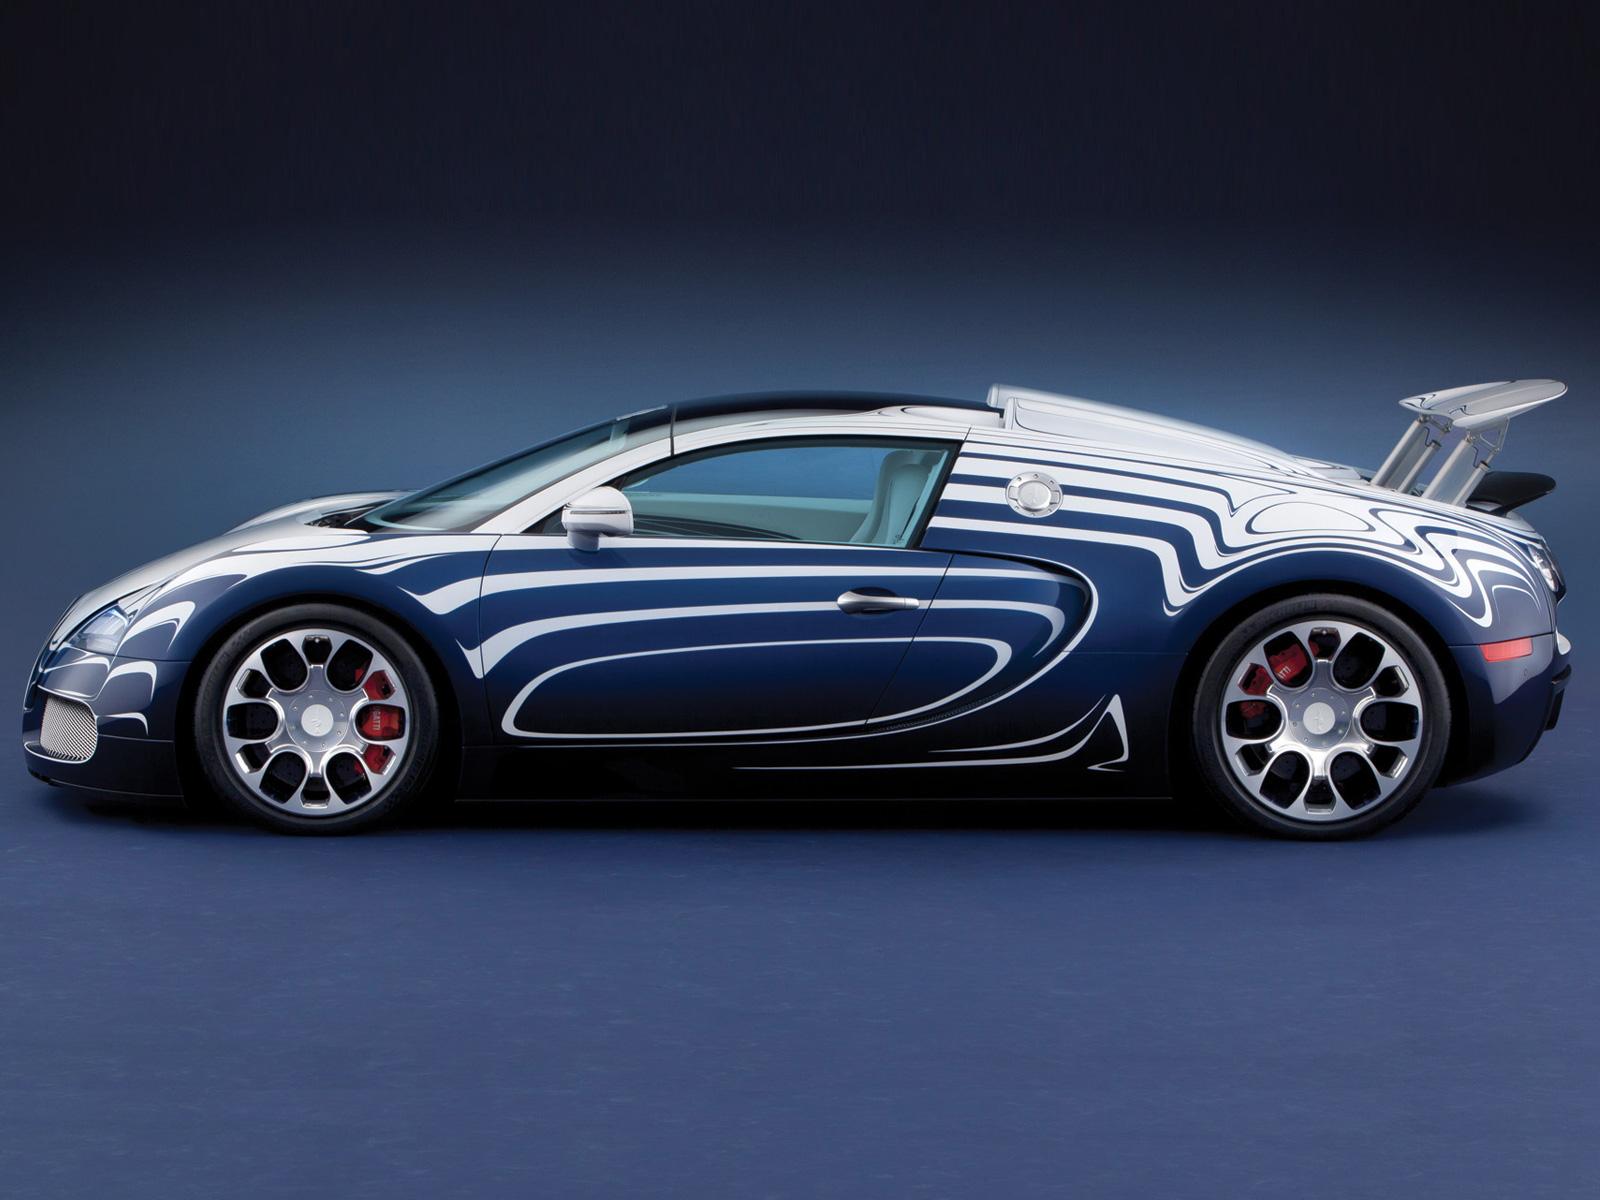 Bugatti Veyron Super Sport For Sale free image download